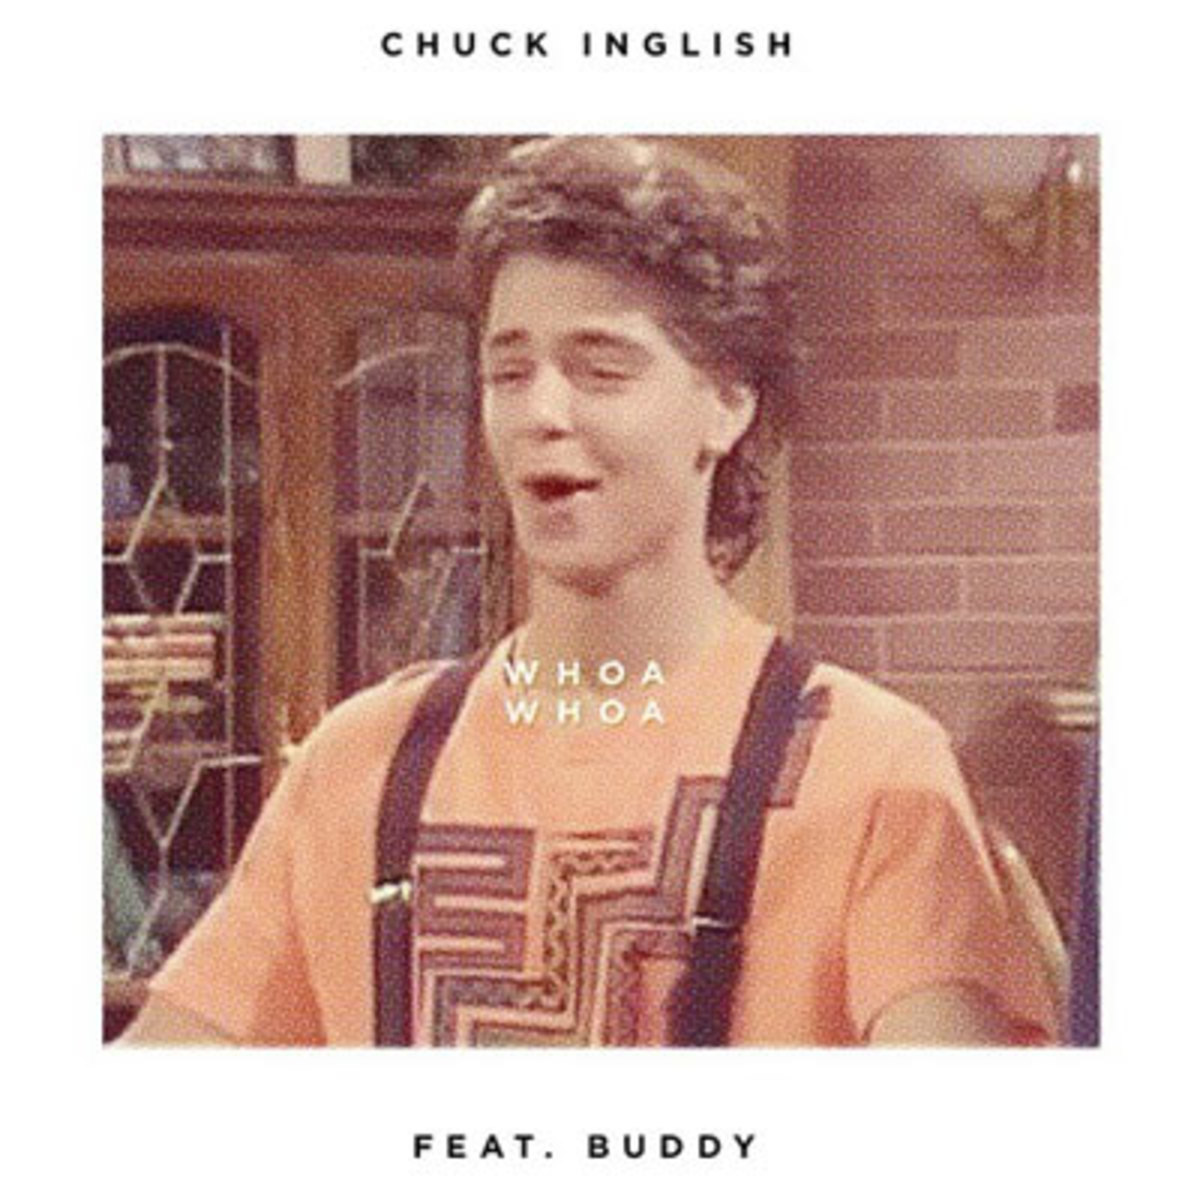 chuck-inglish-whoa-whoa.jpg